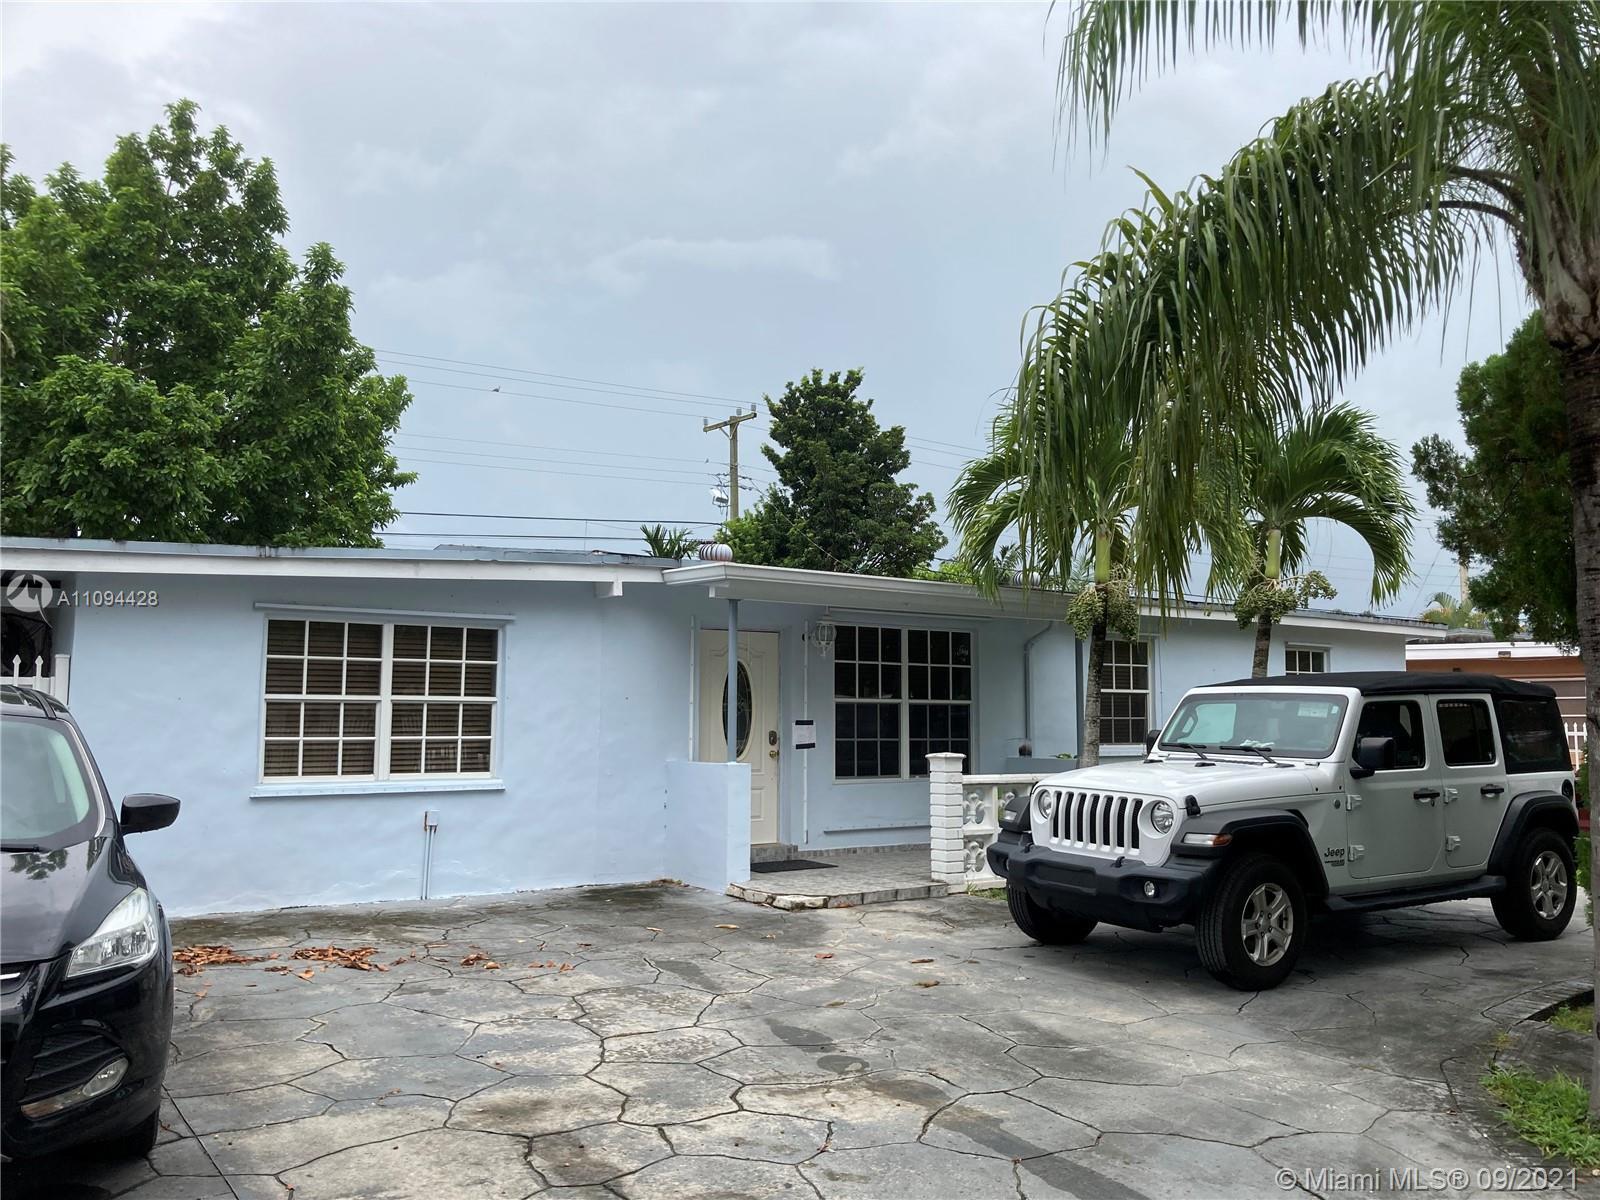 Westwood Lake - 4121 SW 112th Ave, Miami, FL 33165